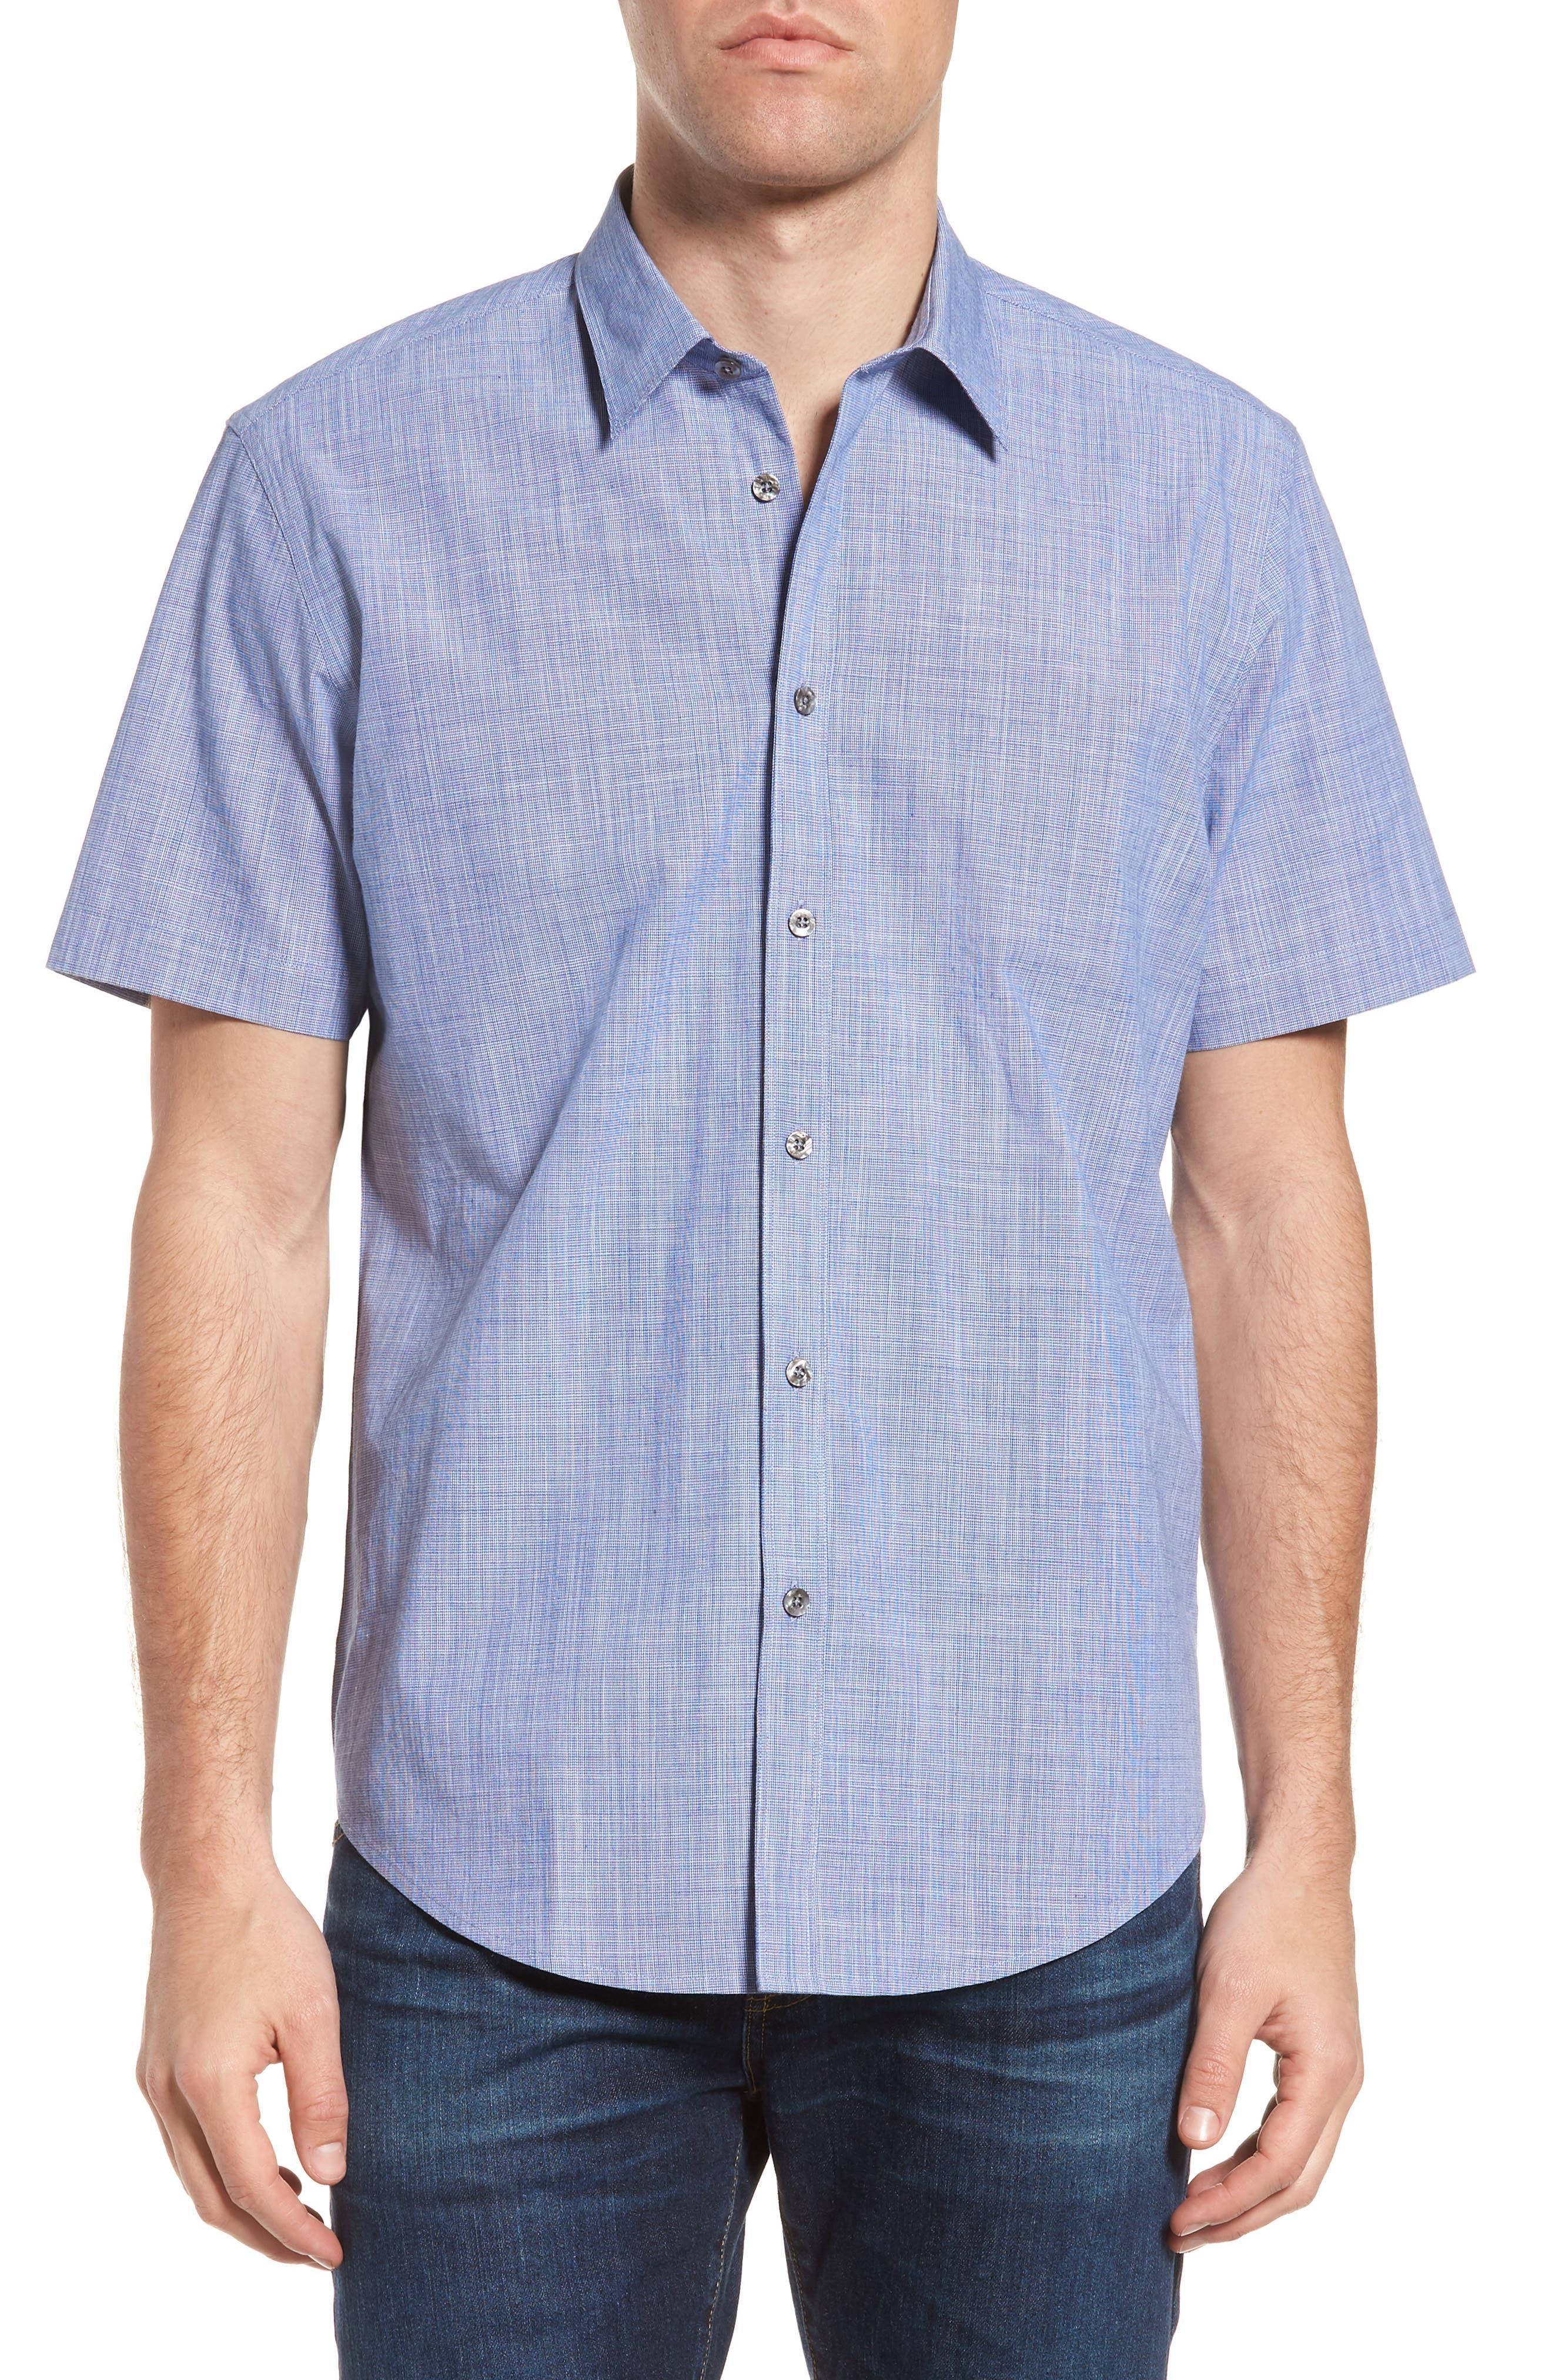 Coastaoro Savas Regular Fit Sport Shirt